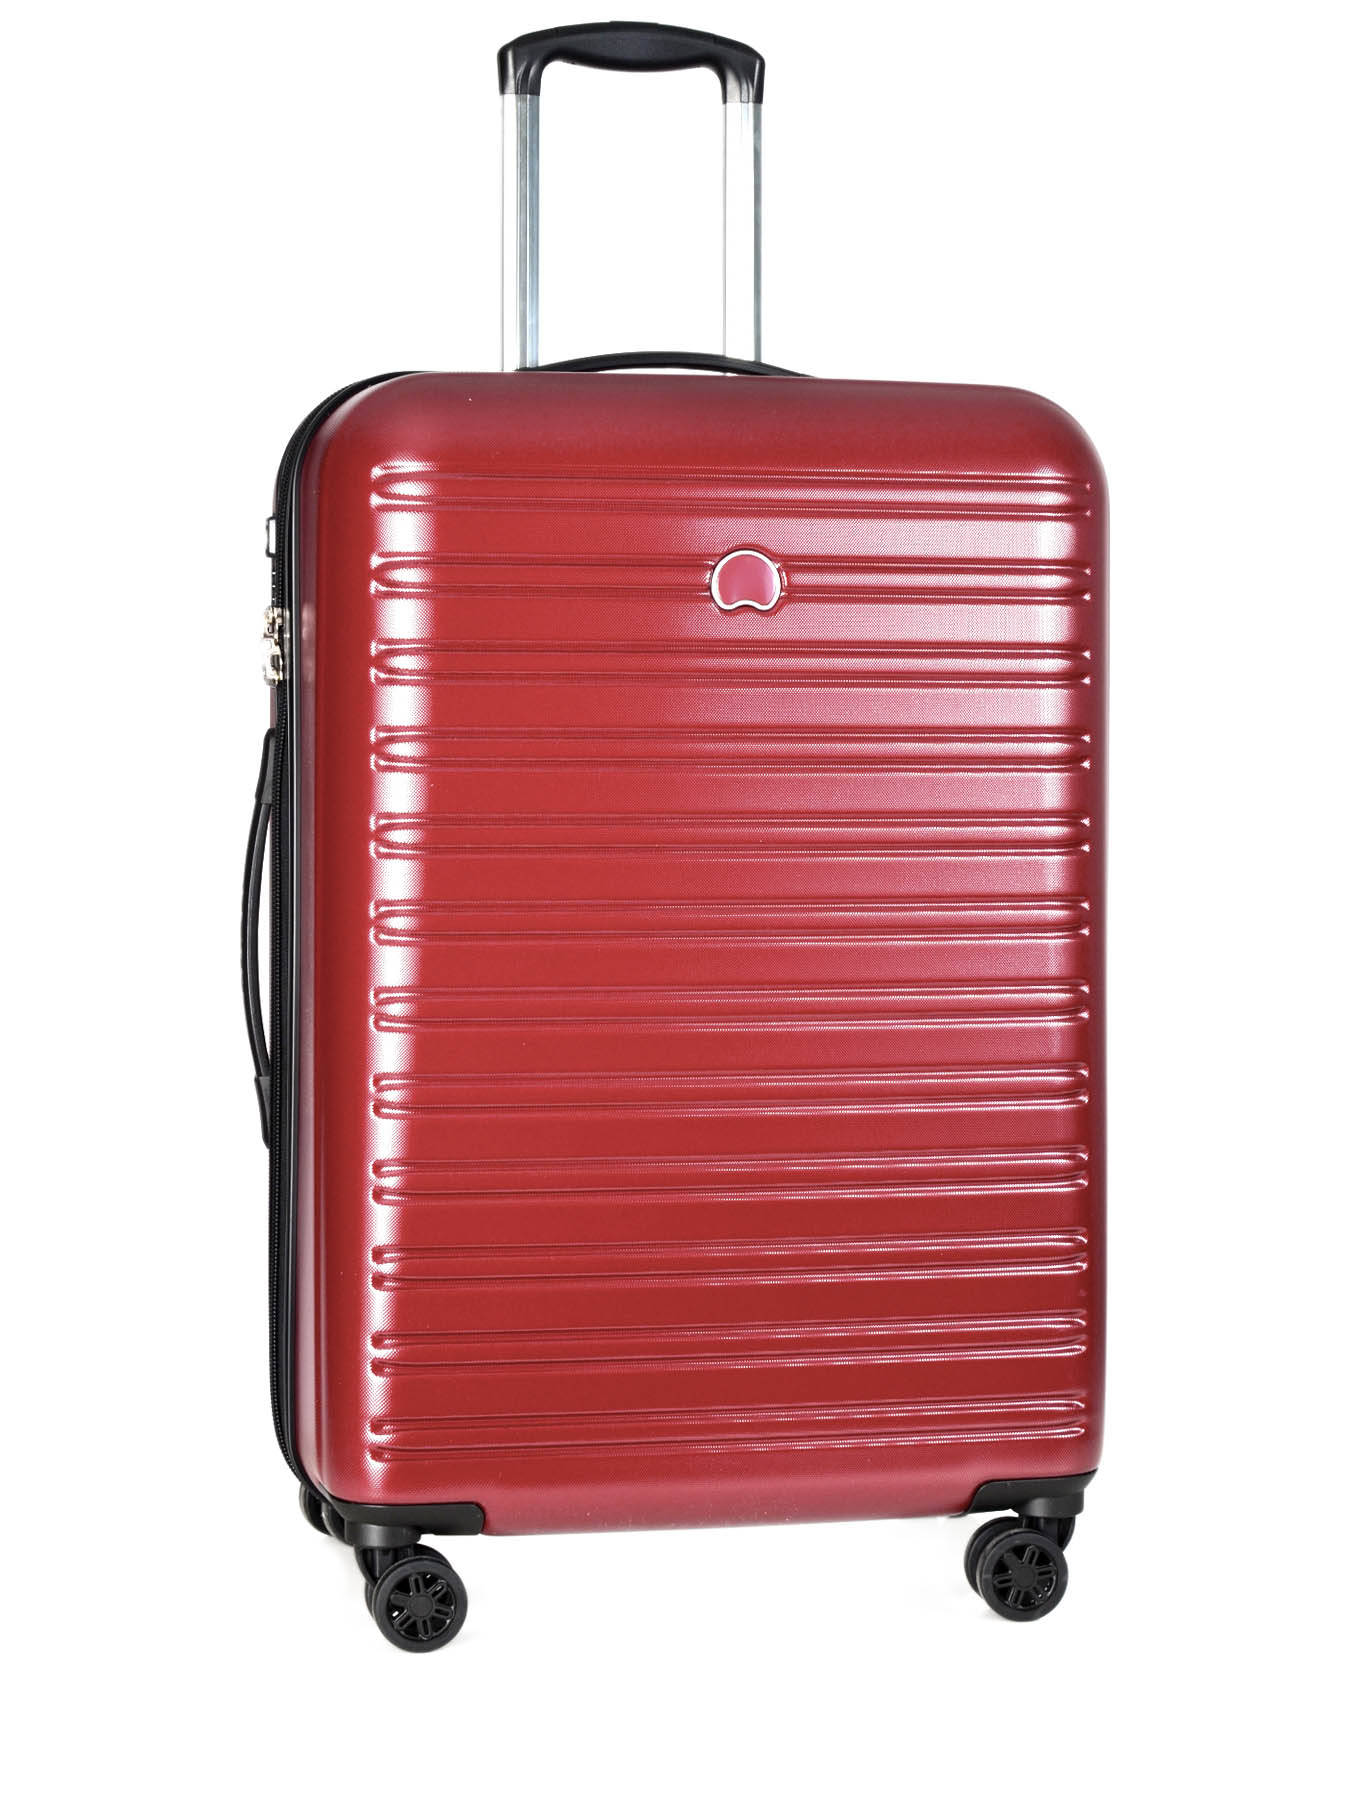 valise rigide delsey segur rouge en vente au meilleur prix. Black Bedroom Furniture Sets. Home Design Ideas